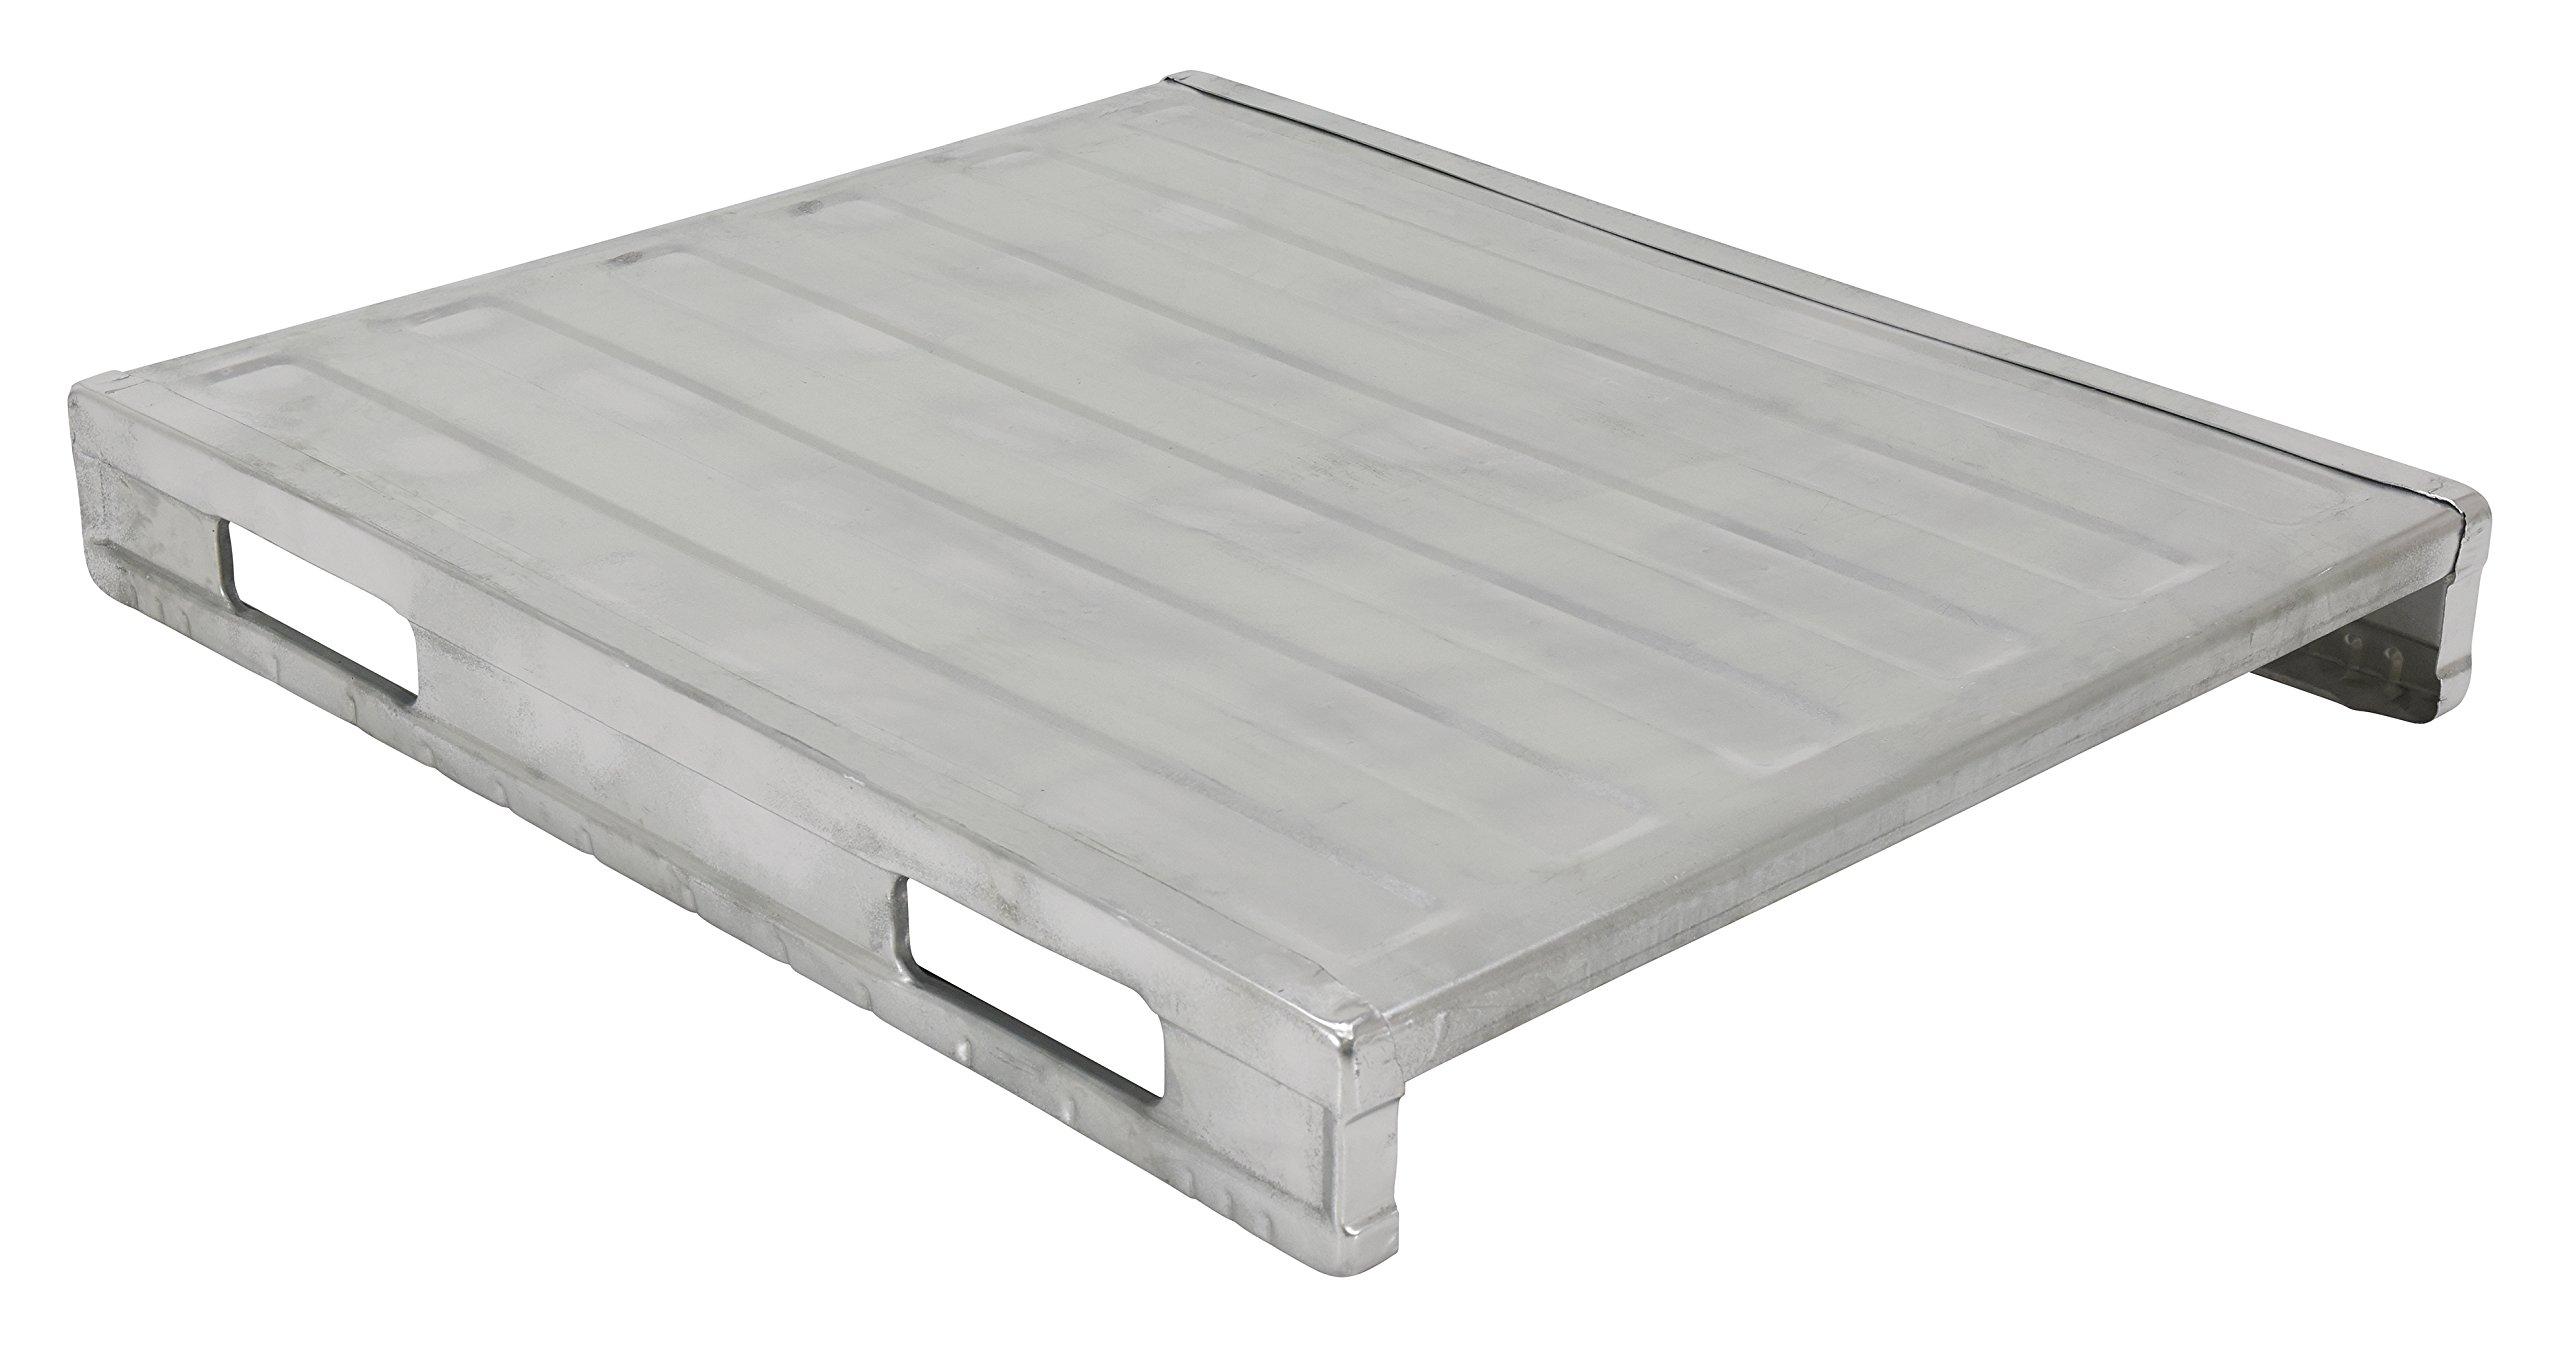 Vestil SDSP-4048 Steel Solid Deck Pallet, 4000 lbs Capacity, 40'' Width, 6'' Height, 48'' Depth